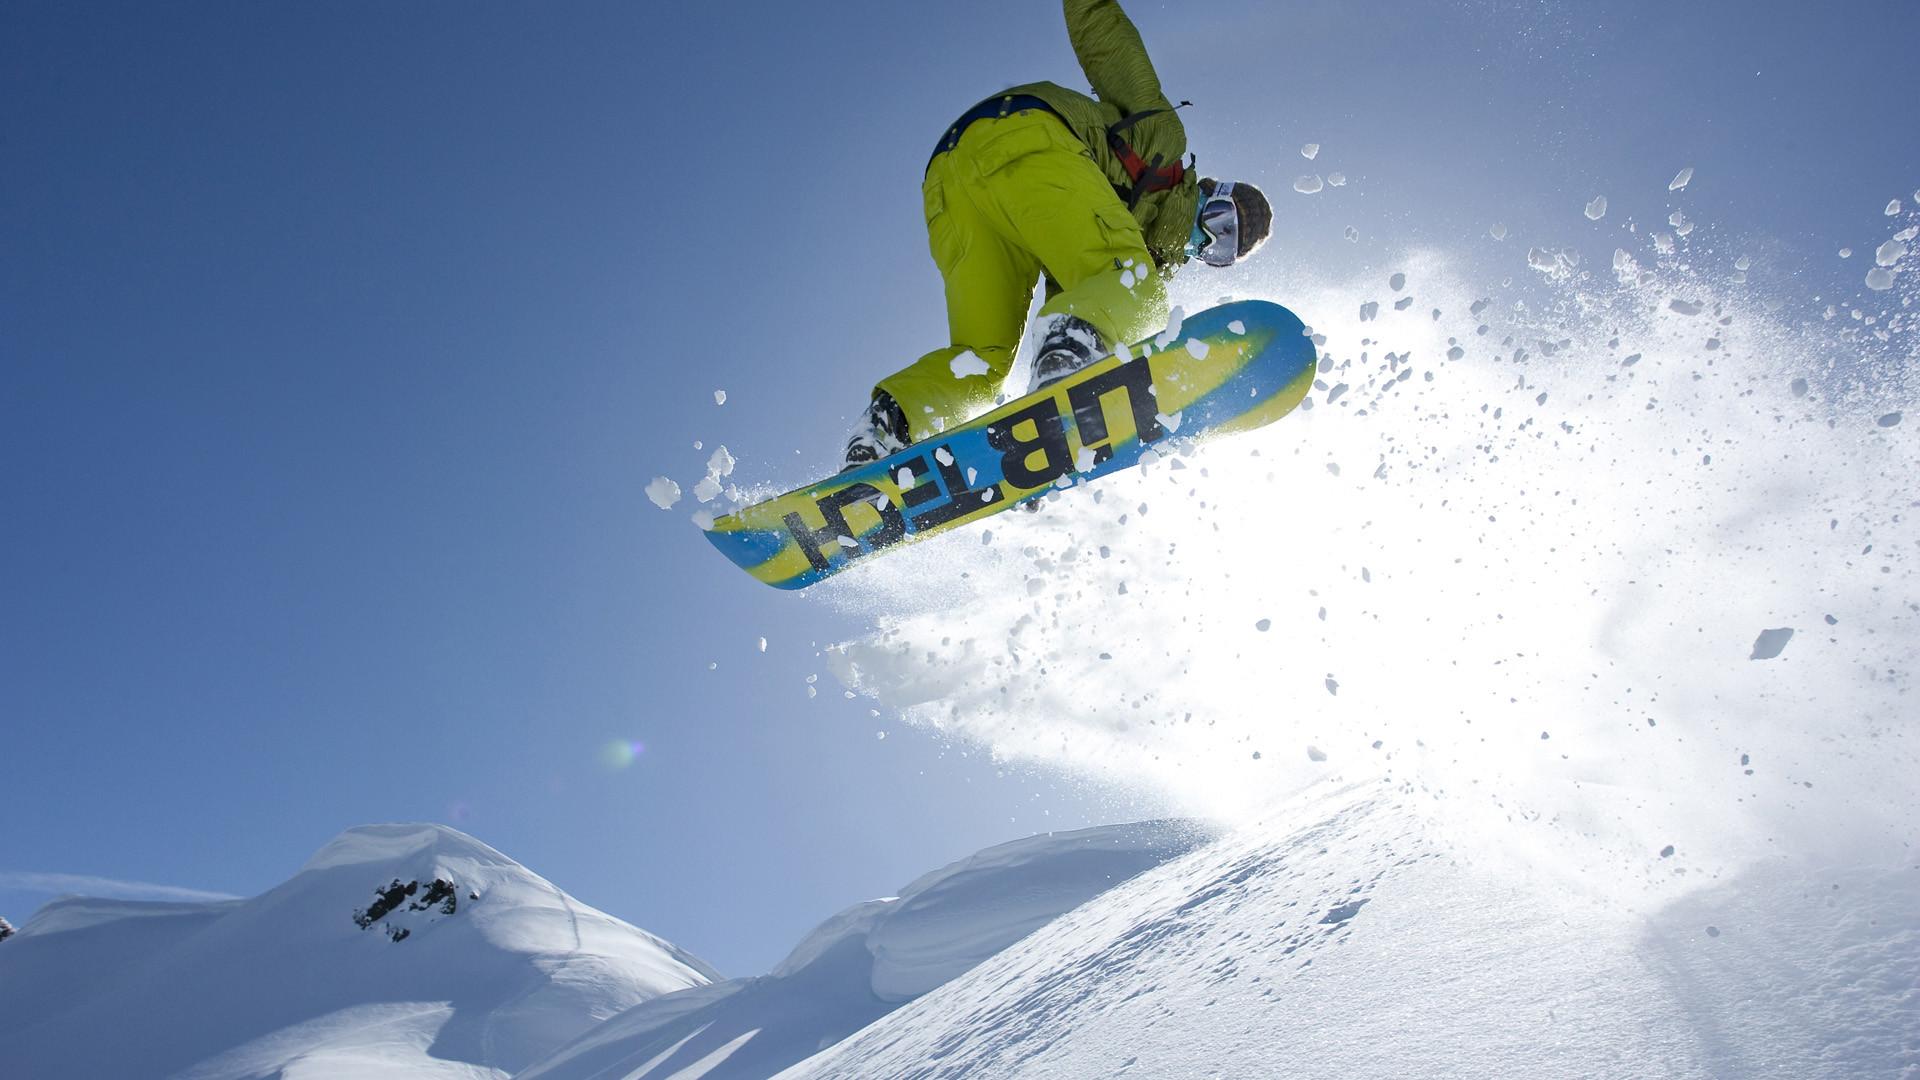 New Hd Wallpaper Girl Download Snowboarding Wallpaper Hd 72 Images